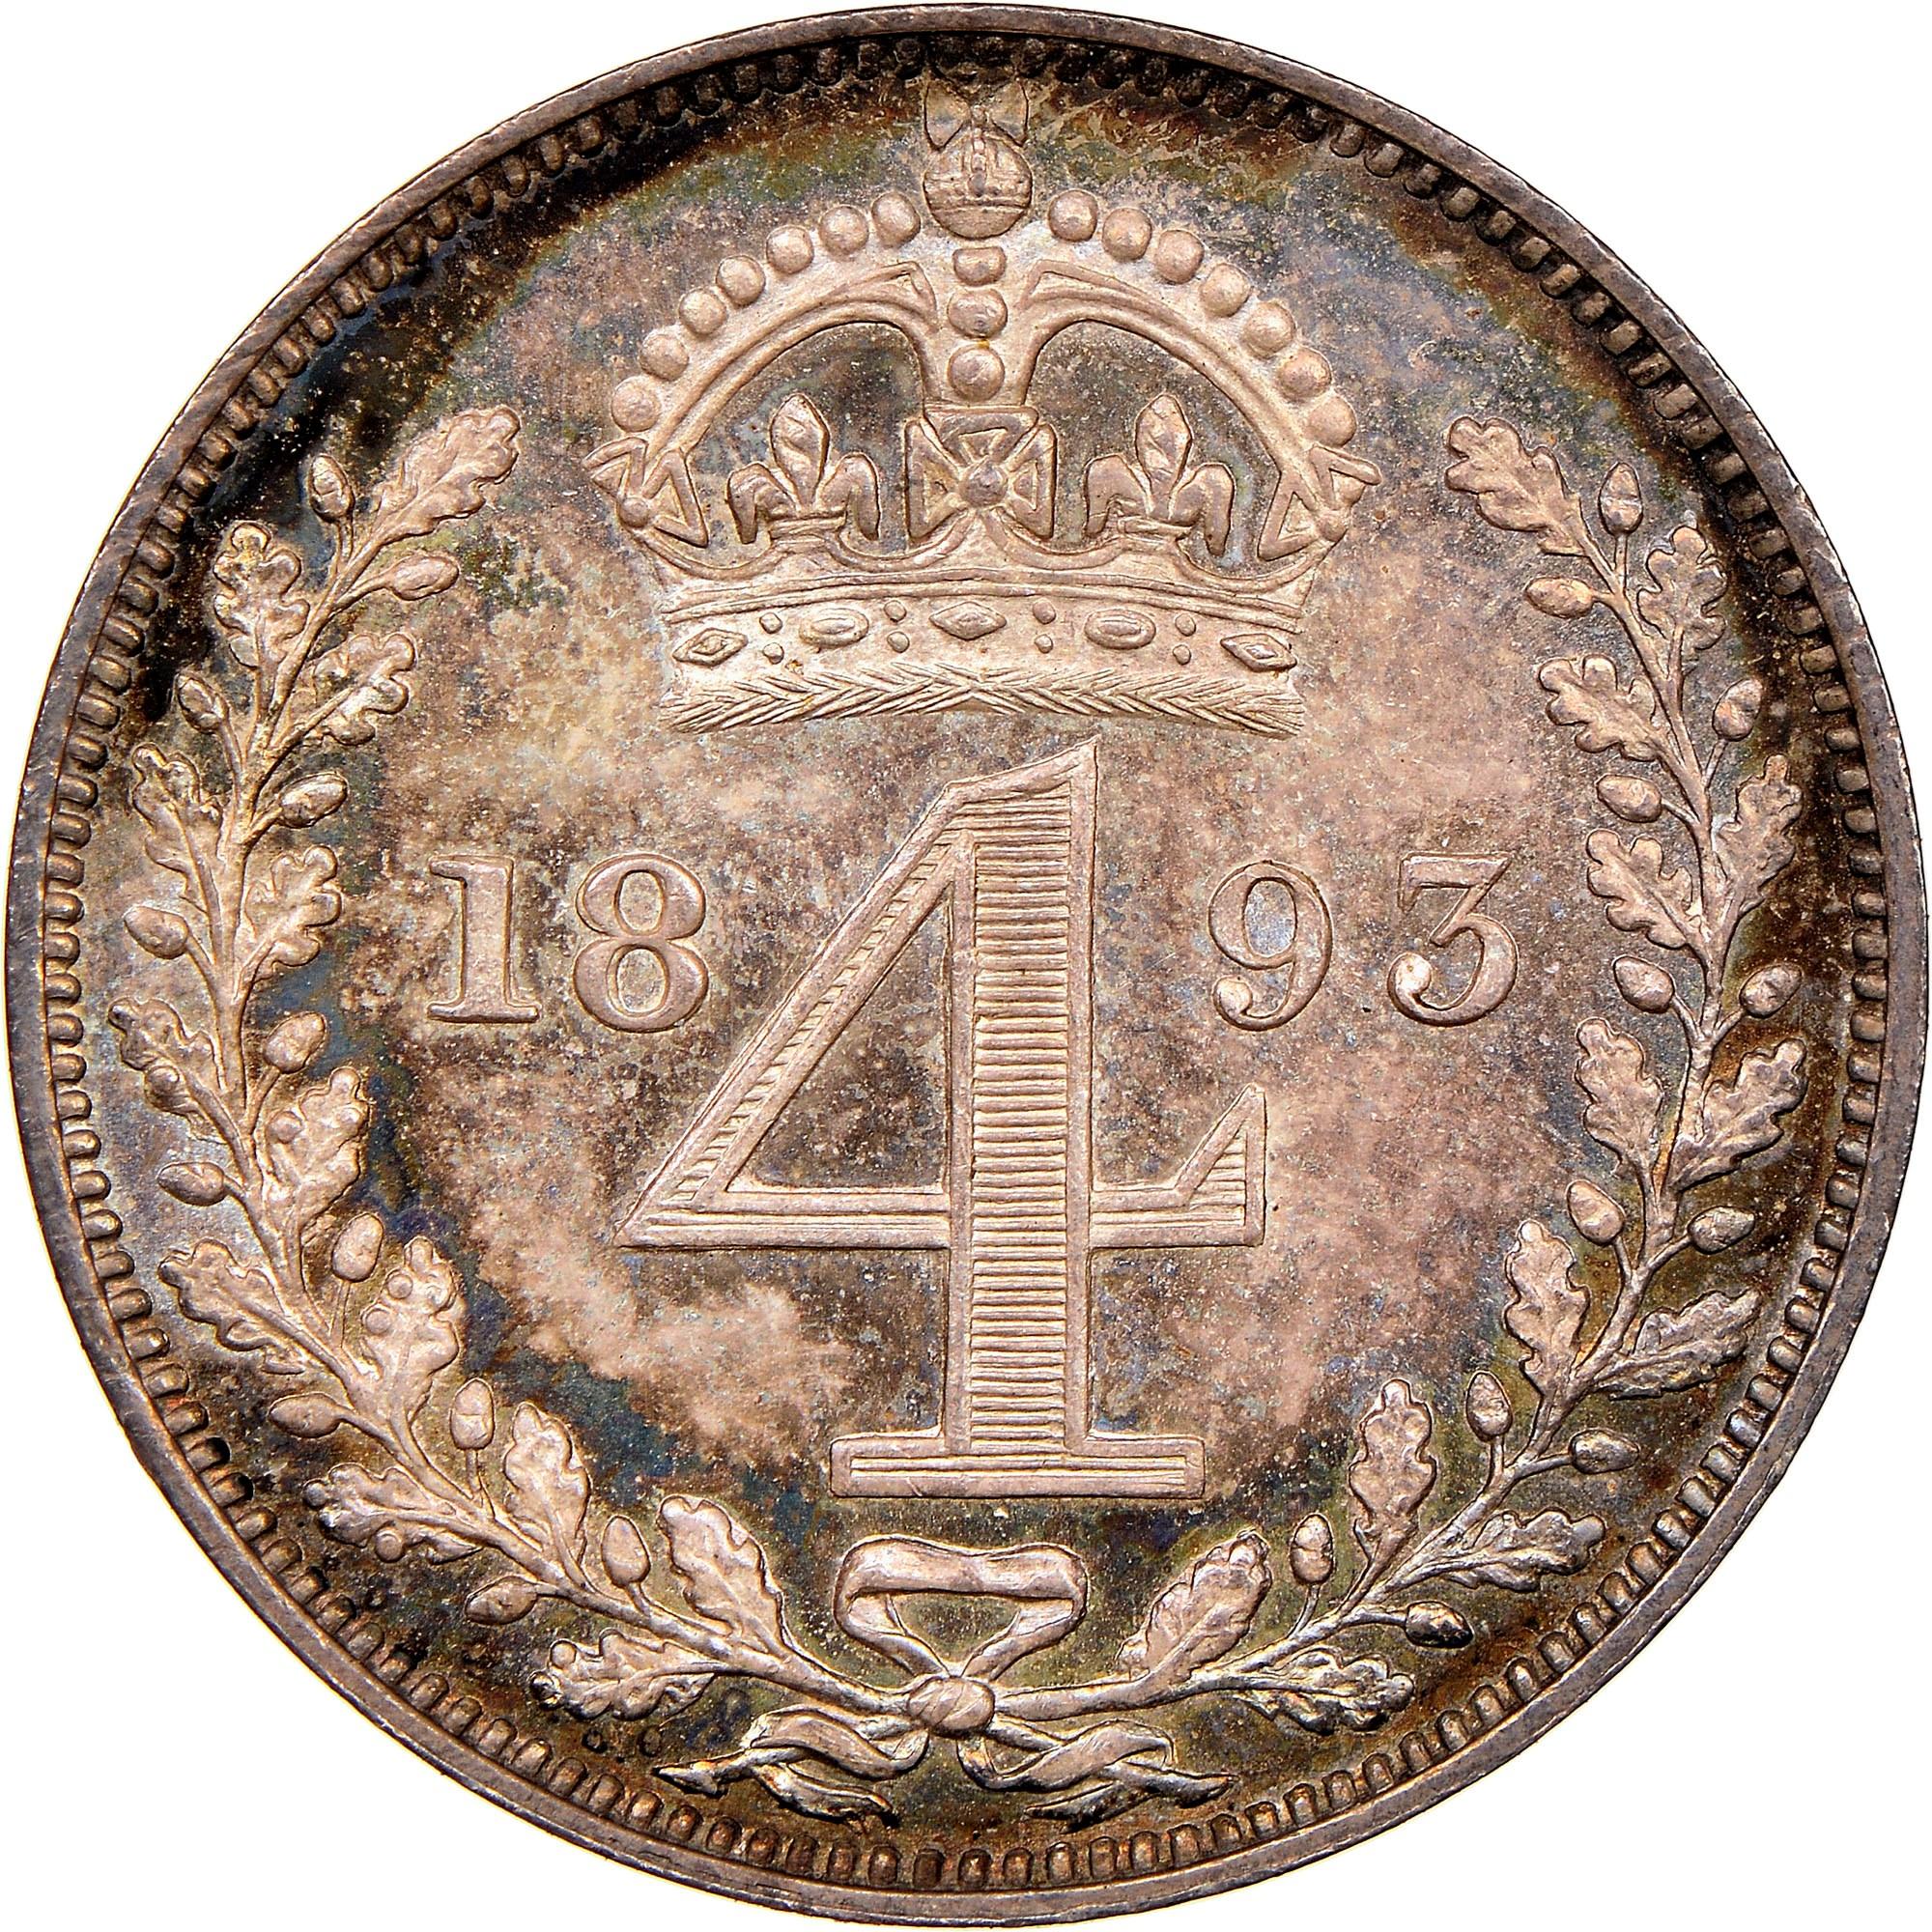 Great Britain 4 Pence reverse